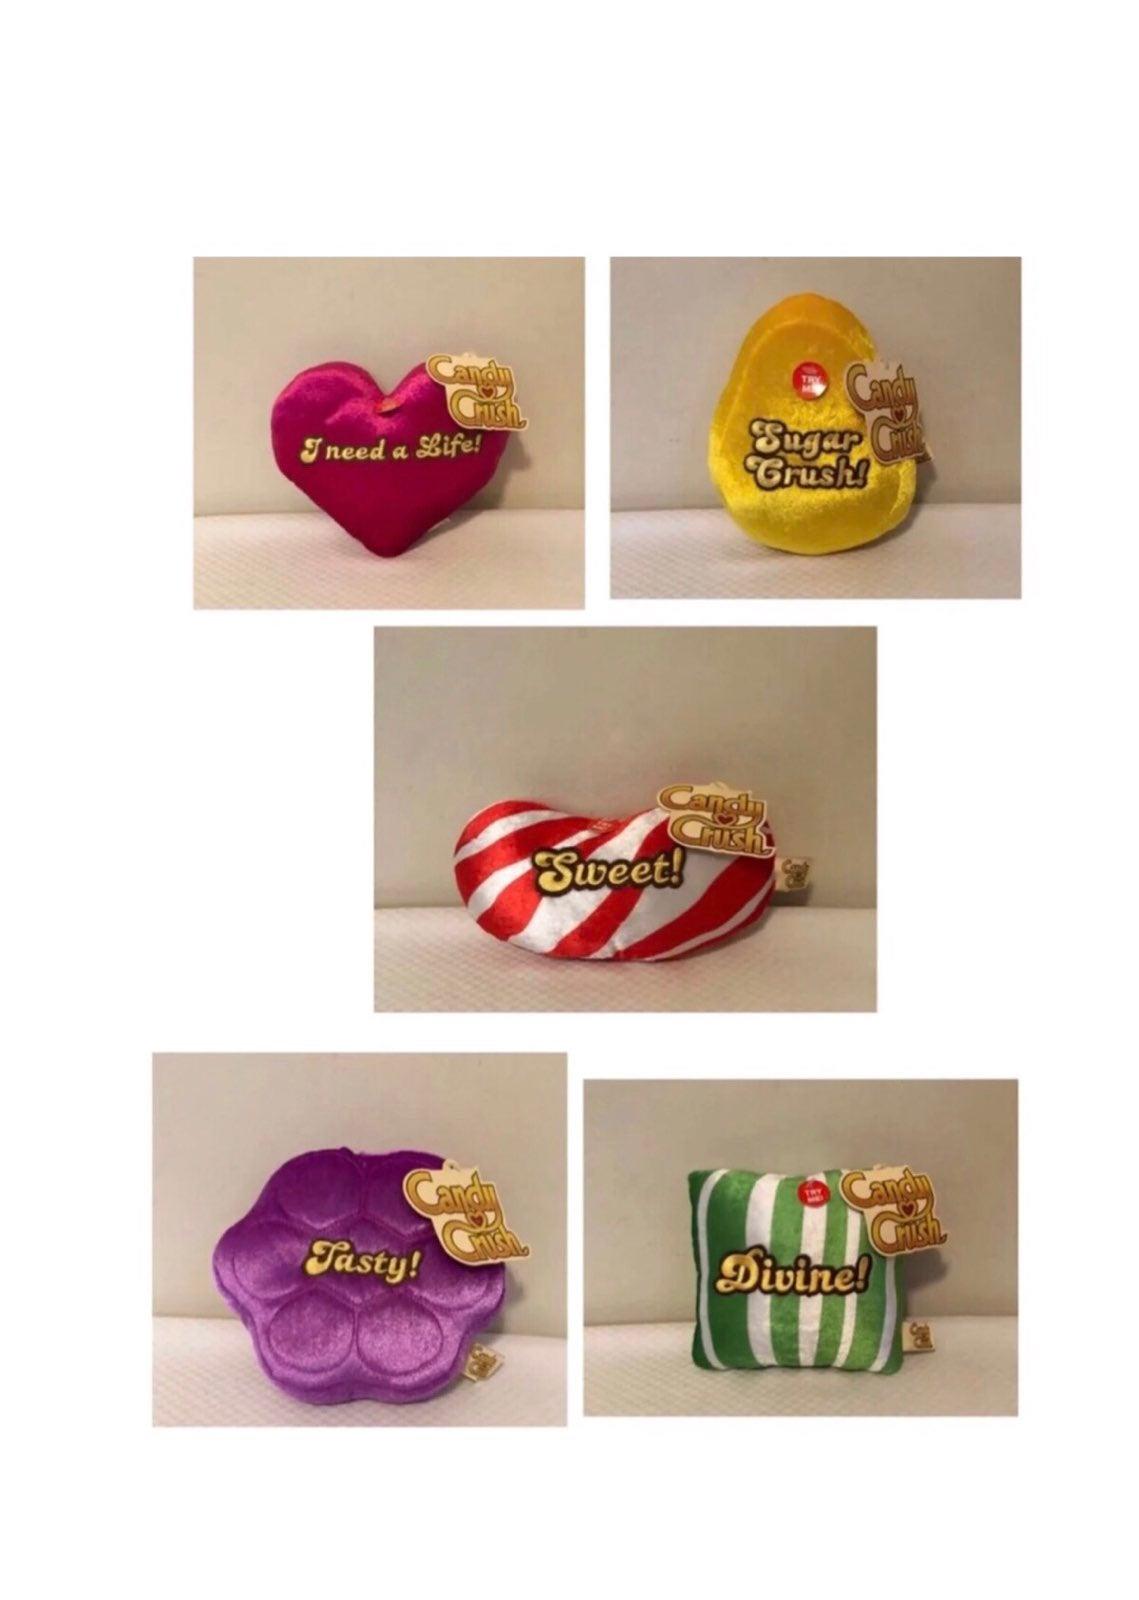 5 Candy Crush Talking Pillows!